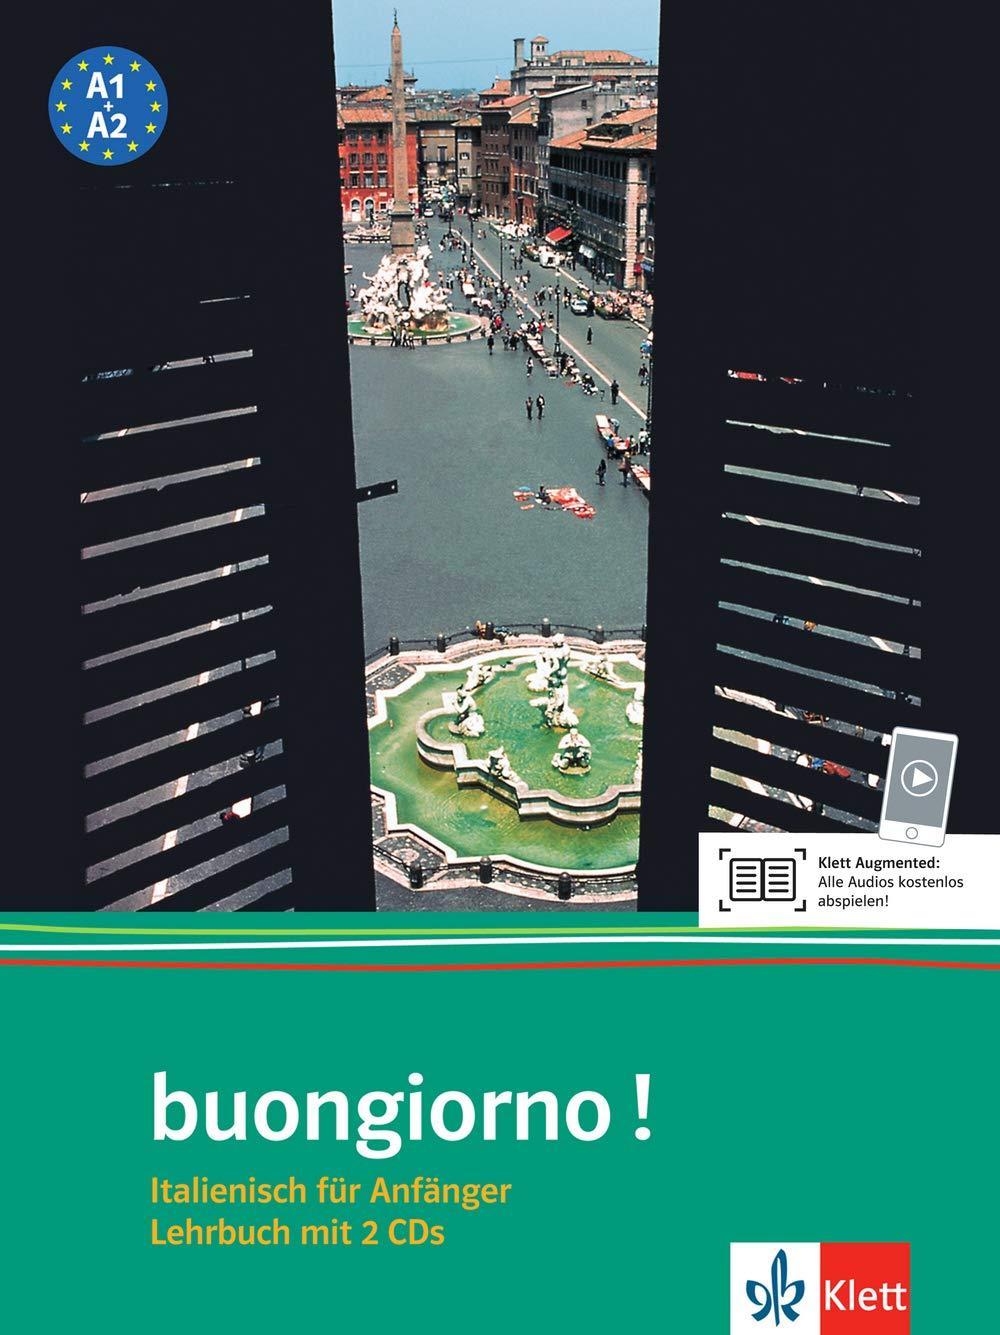 Buongiorno: Italienisch für Anfänger - Lehrbuch  (inkl. 2 CDs)